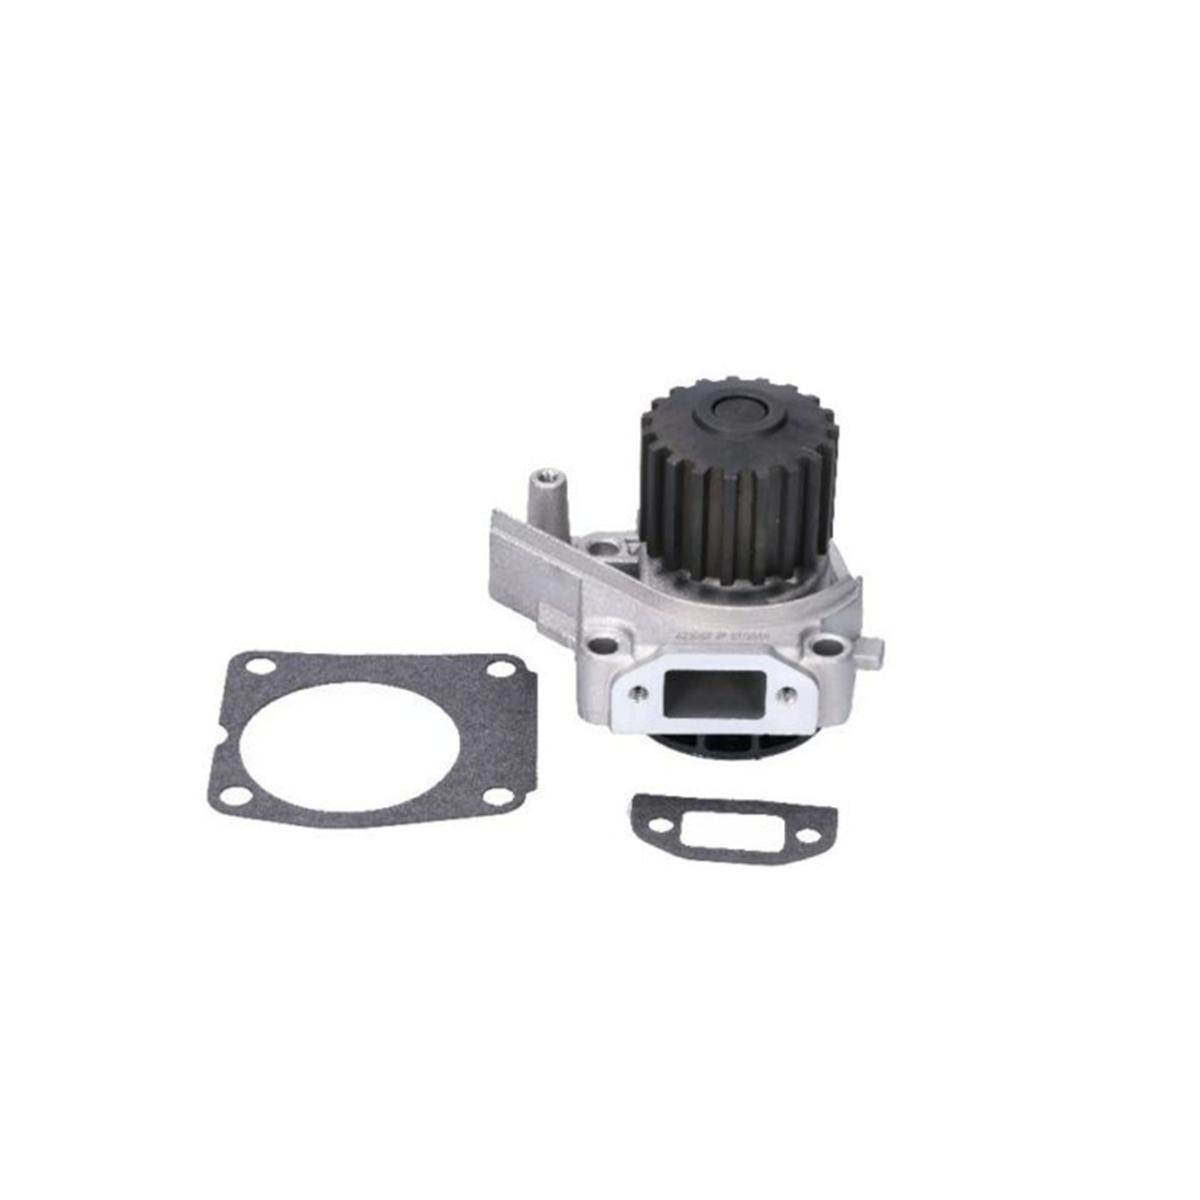 493169 – Pompa acqua per Piaggio quargo – Porter diesel